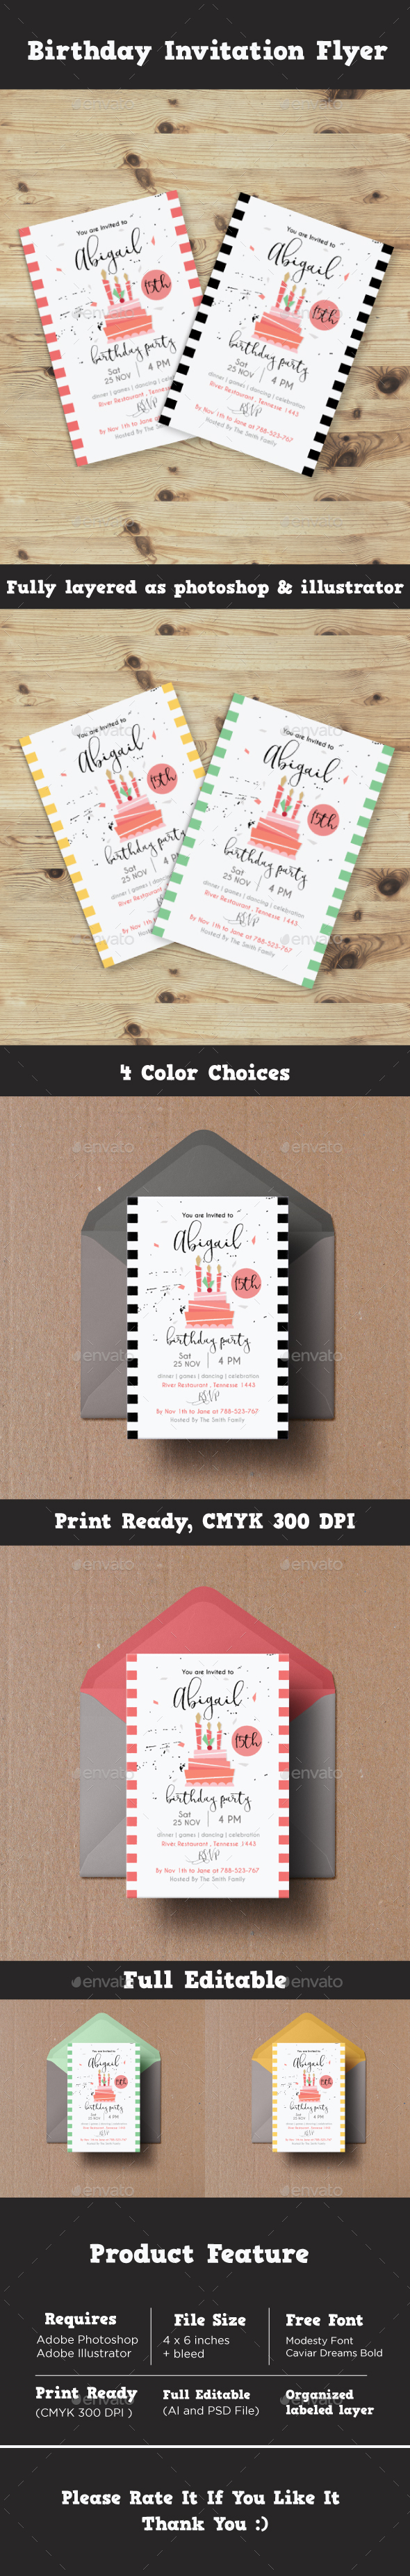 GraphicRiver Birthday Invitation Flyer 20869261